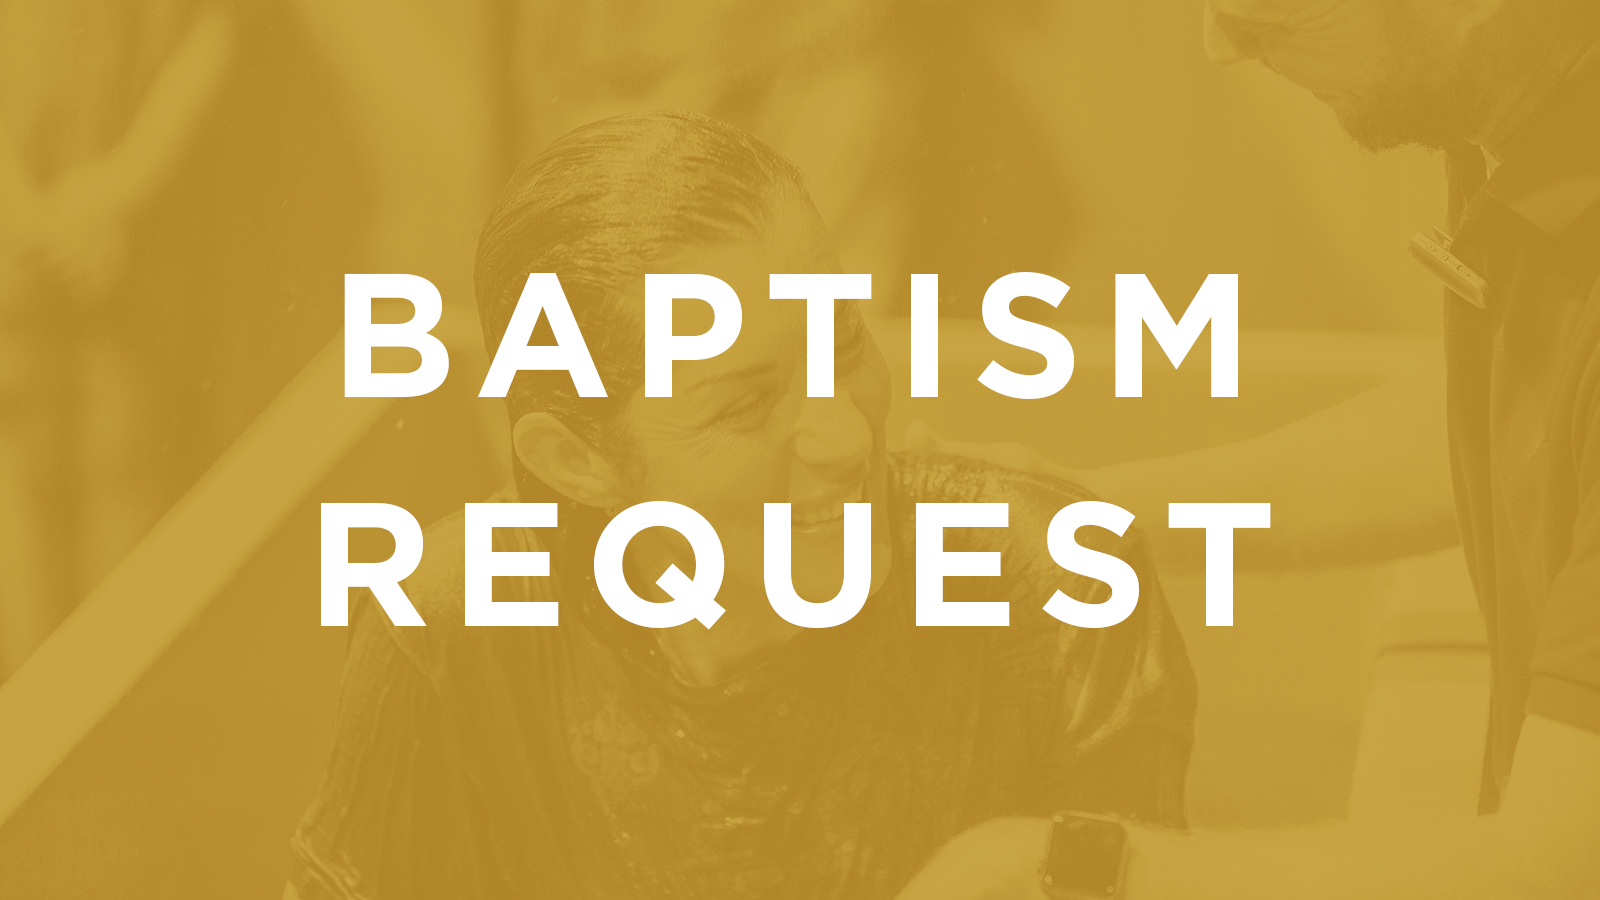 BaptismRequest.jpg